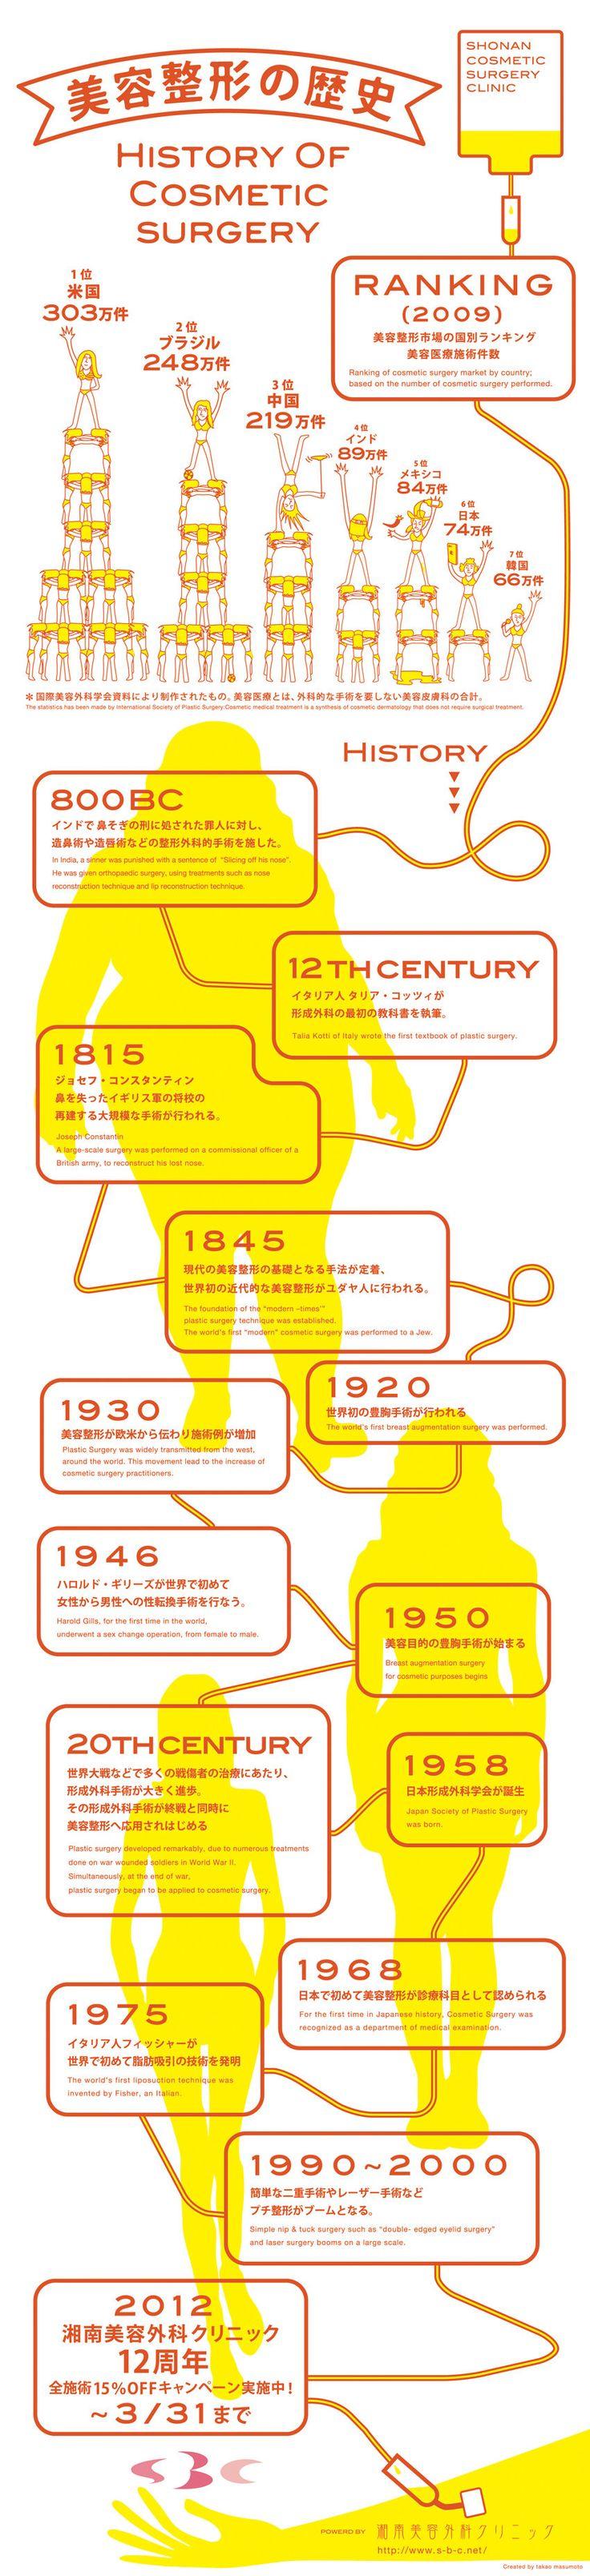 History of Cosmetic Surgery - very interesting! @mackmd.com www.mackmd.com